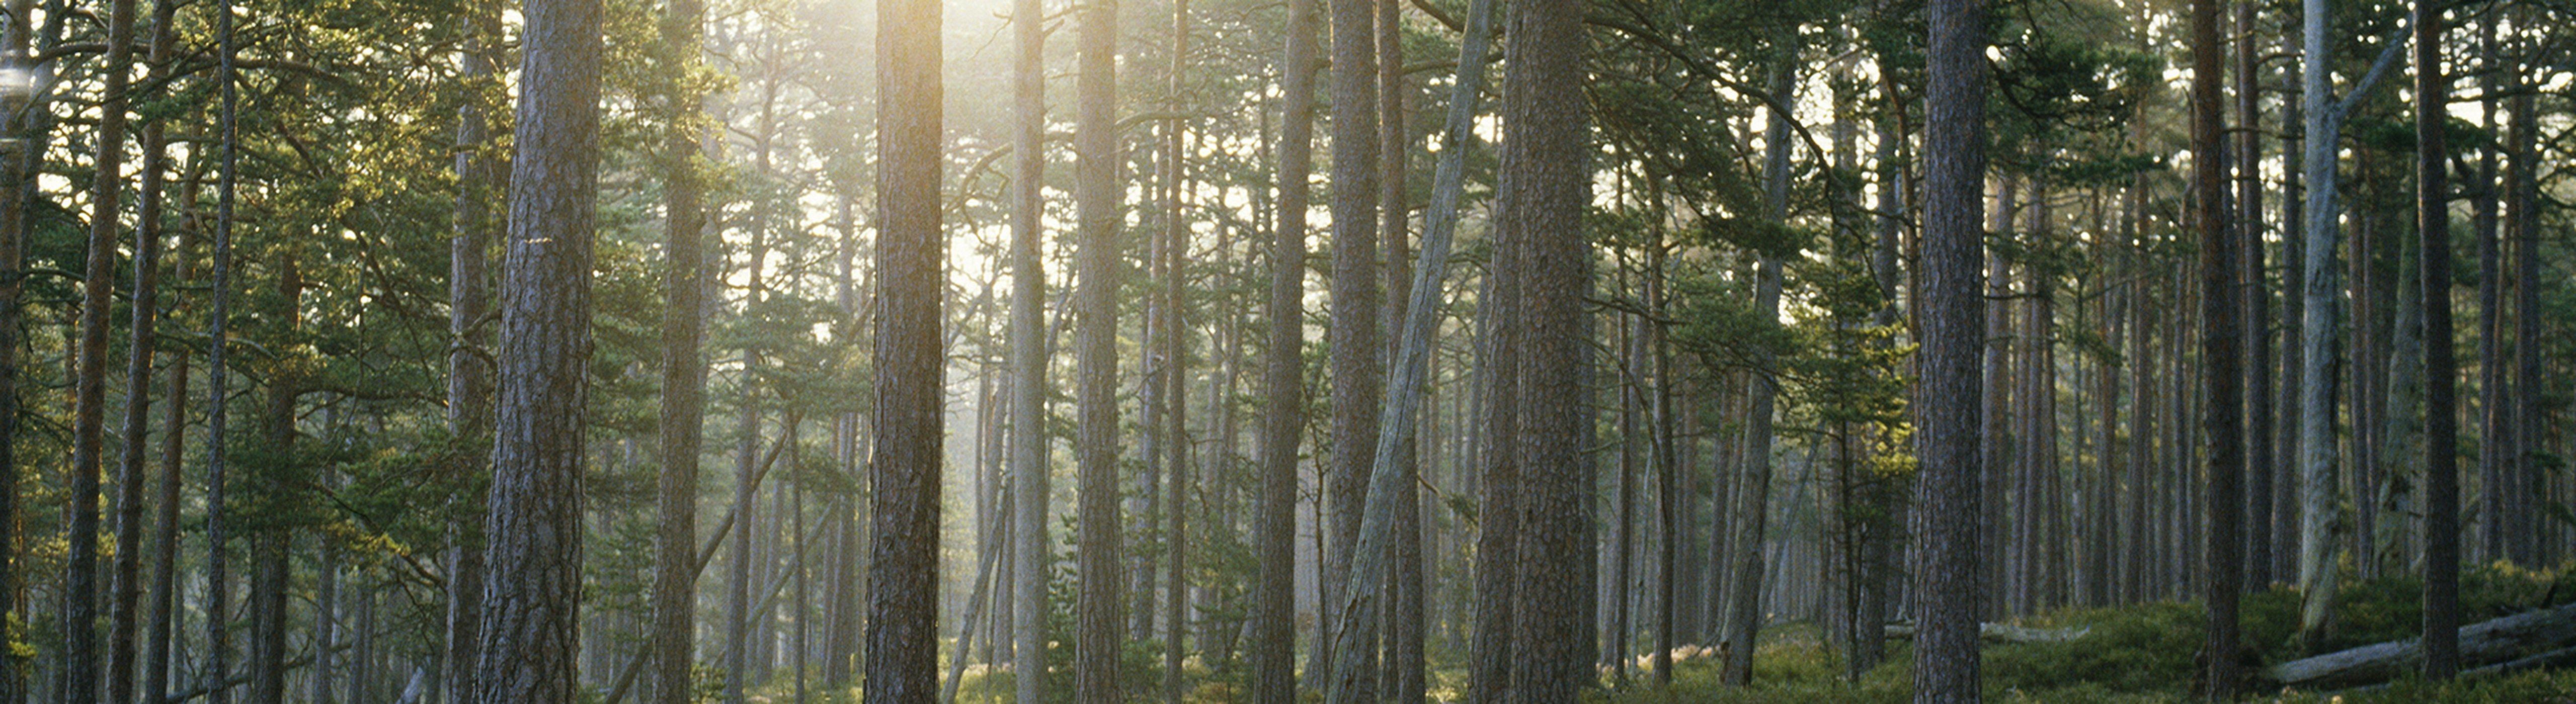 skogsbild_1